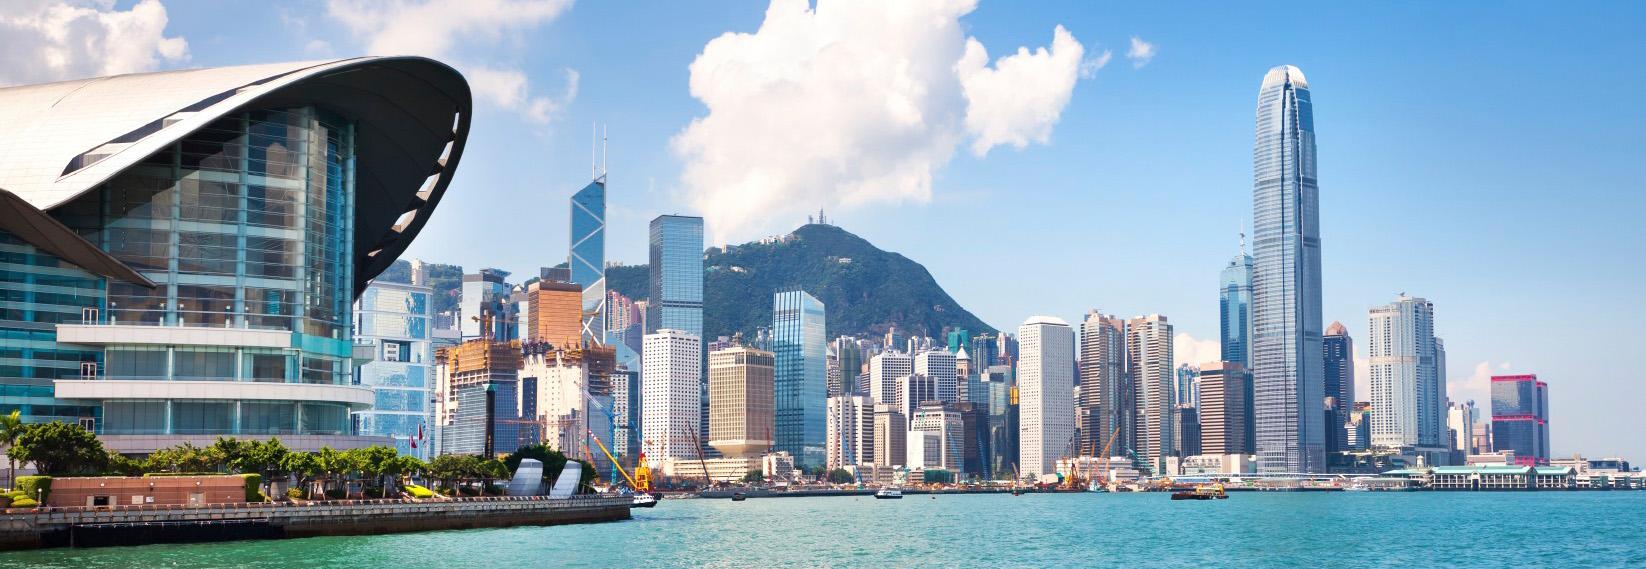 HK-skyline3a34